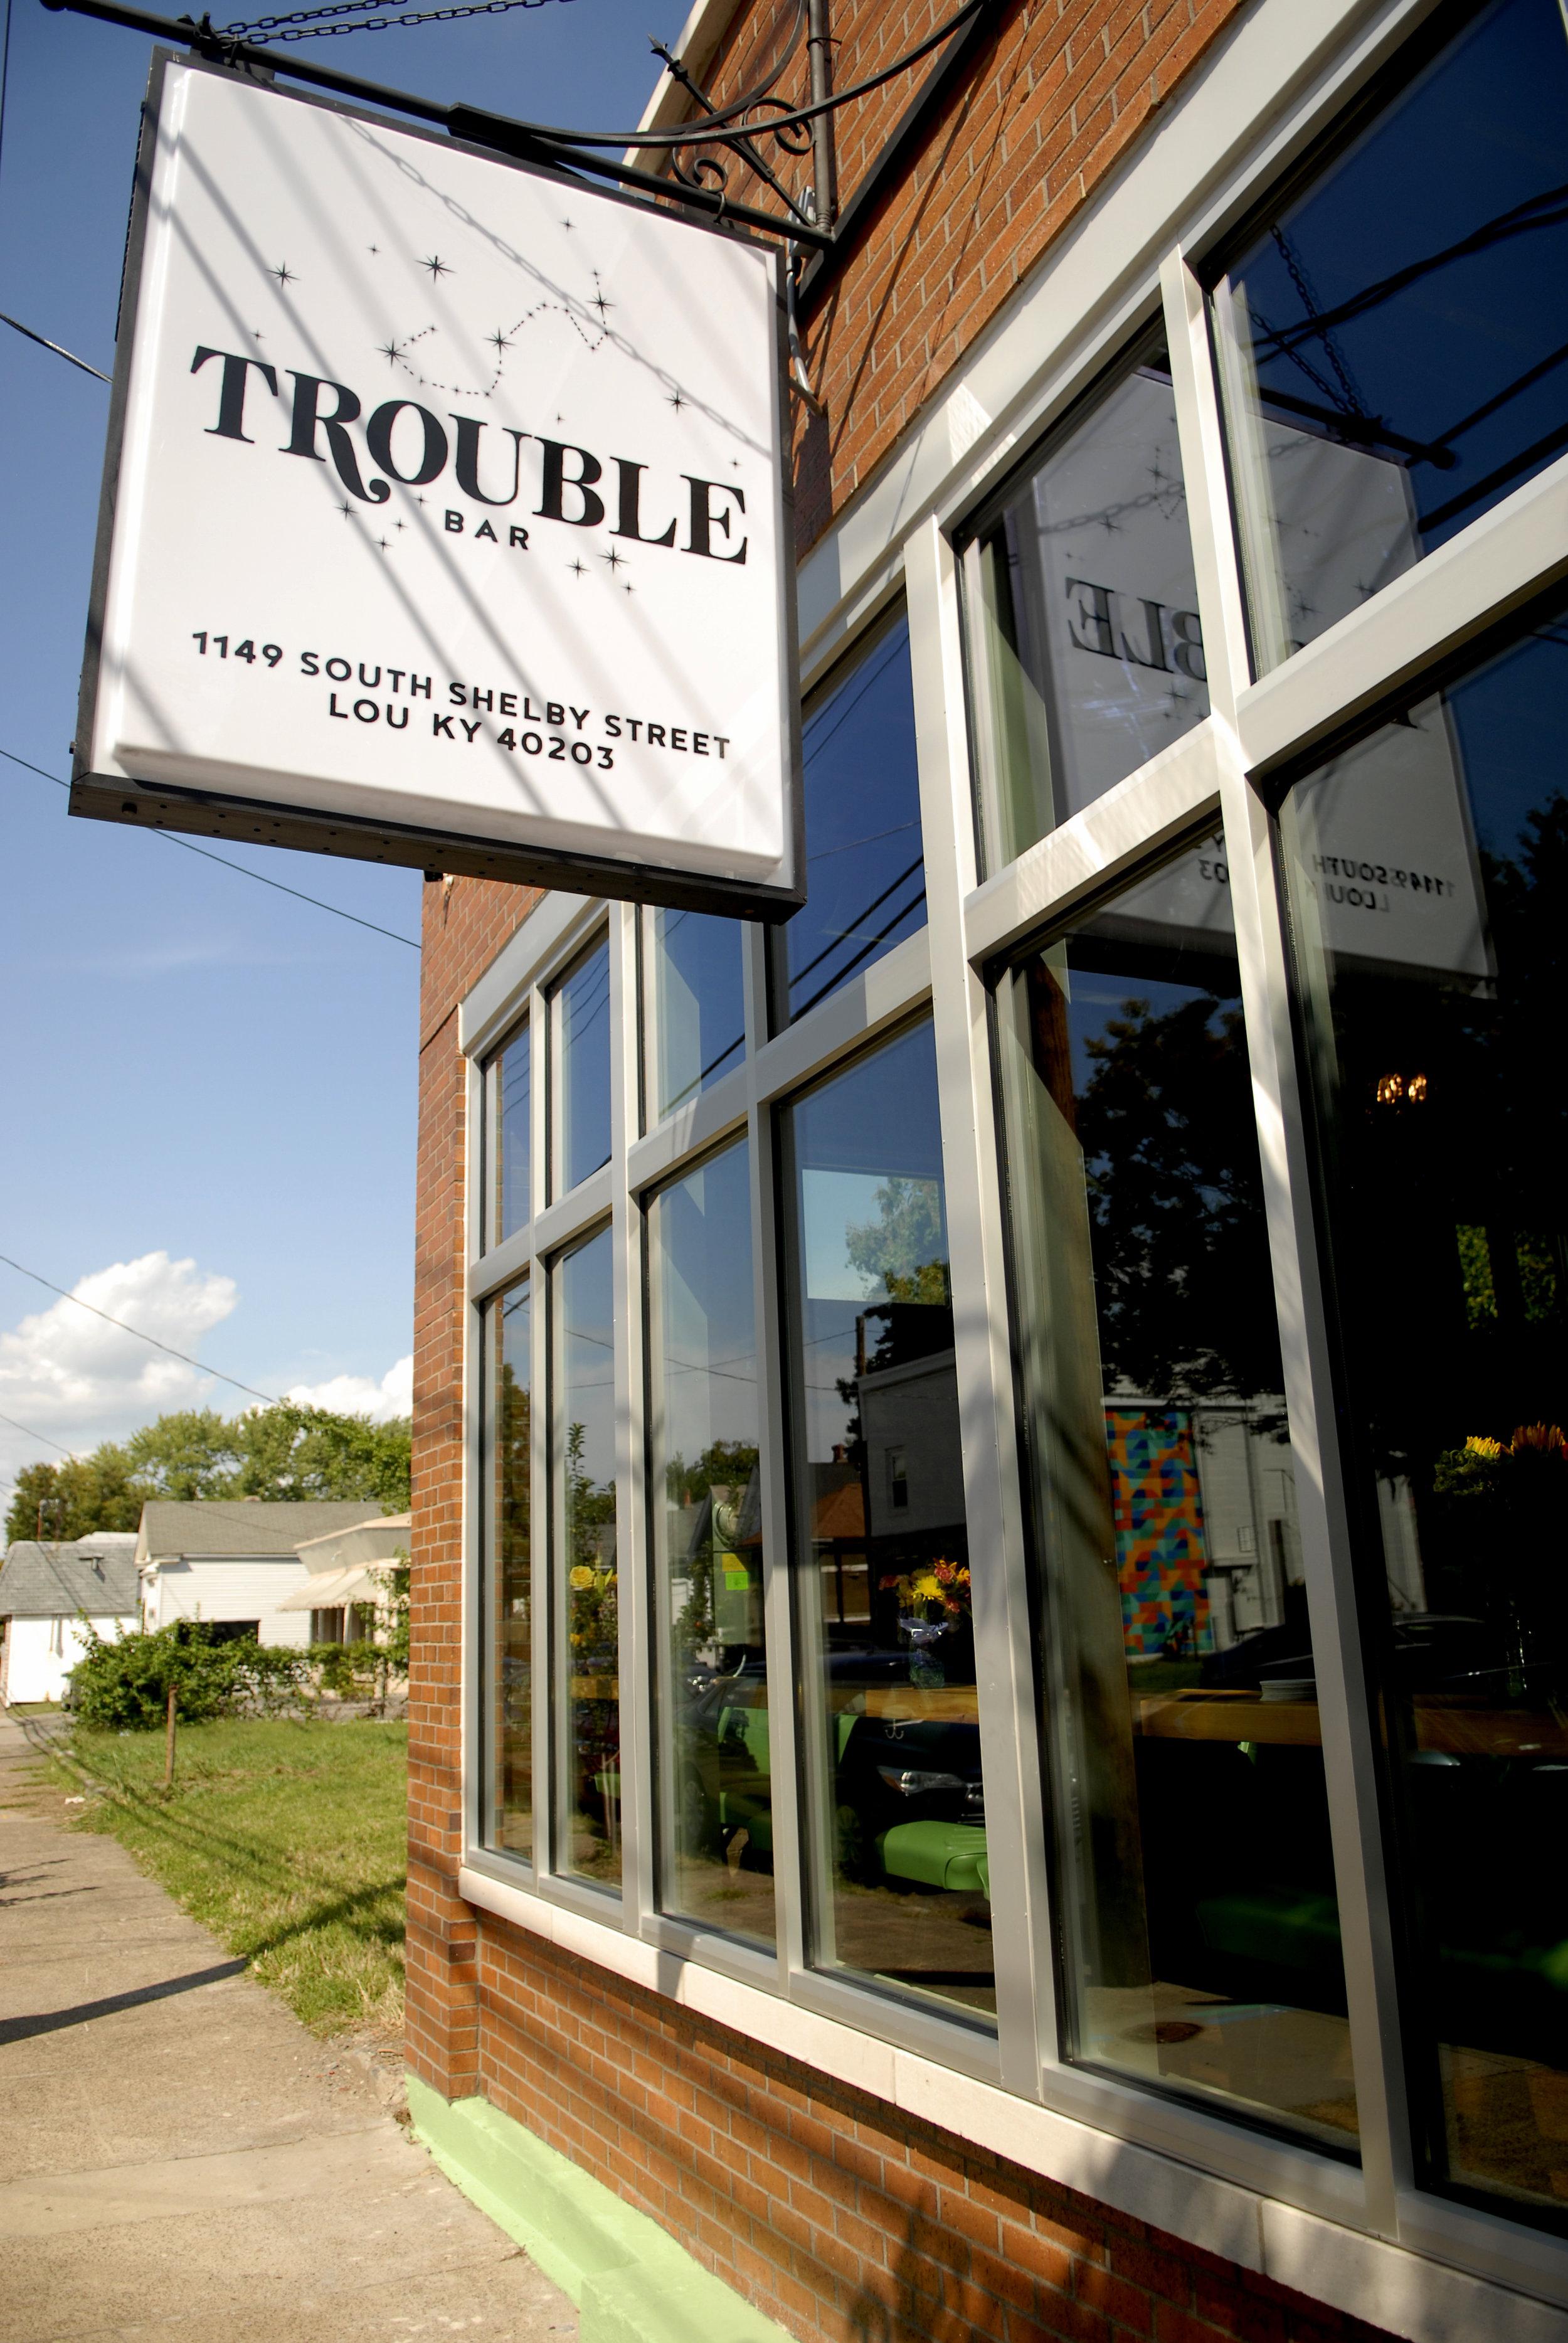 0830_trouble_03_mh.jpg